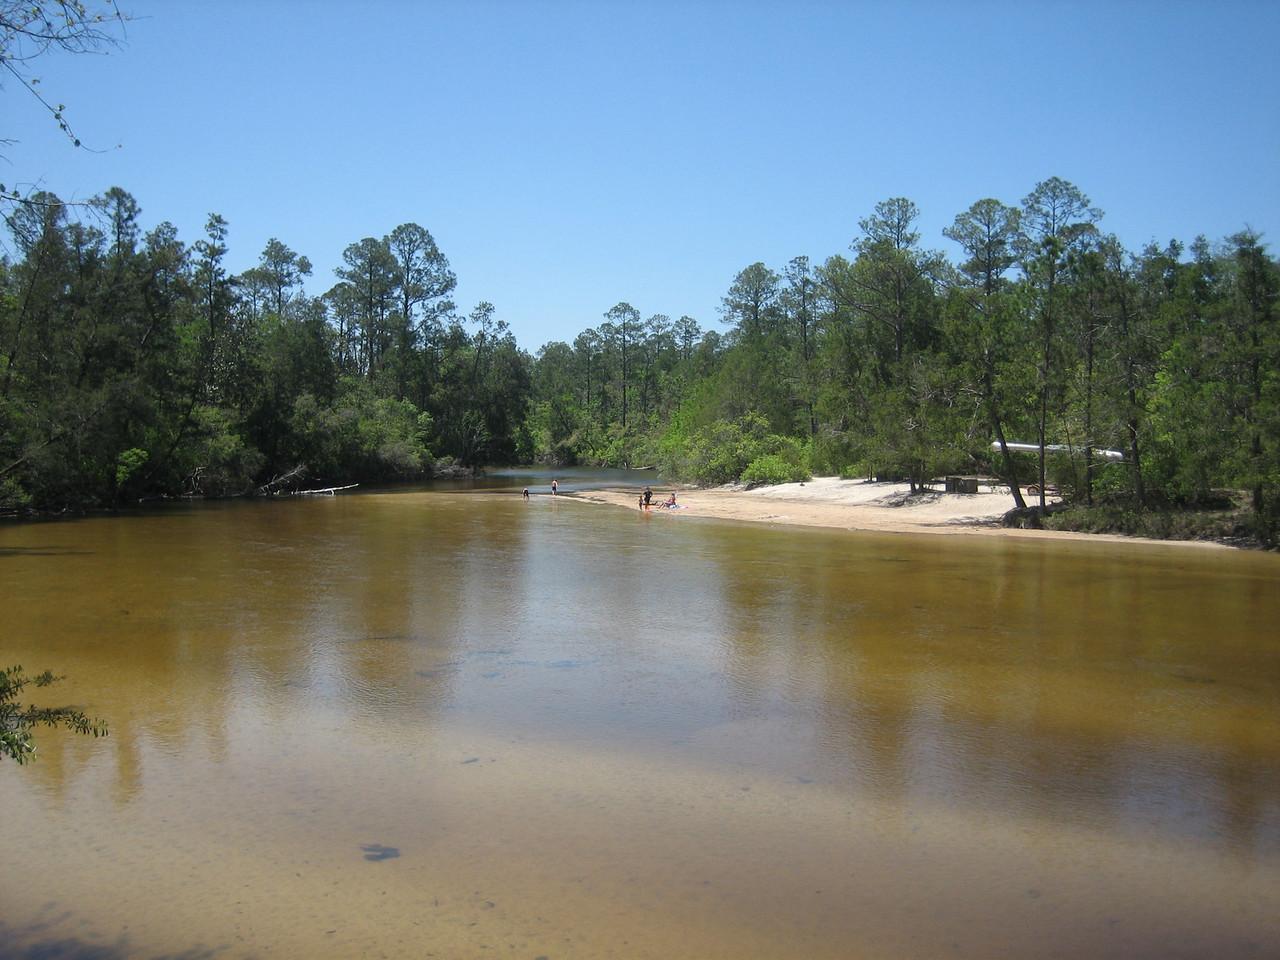 The Blackwater River at Deaton Bridge<br /> PHOTO CREDIT: Sandra Friend / Florida Trail Association